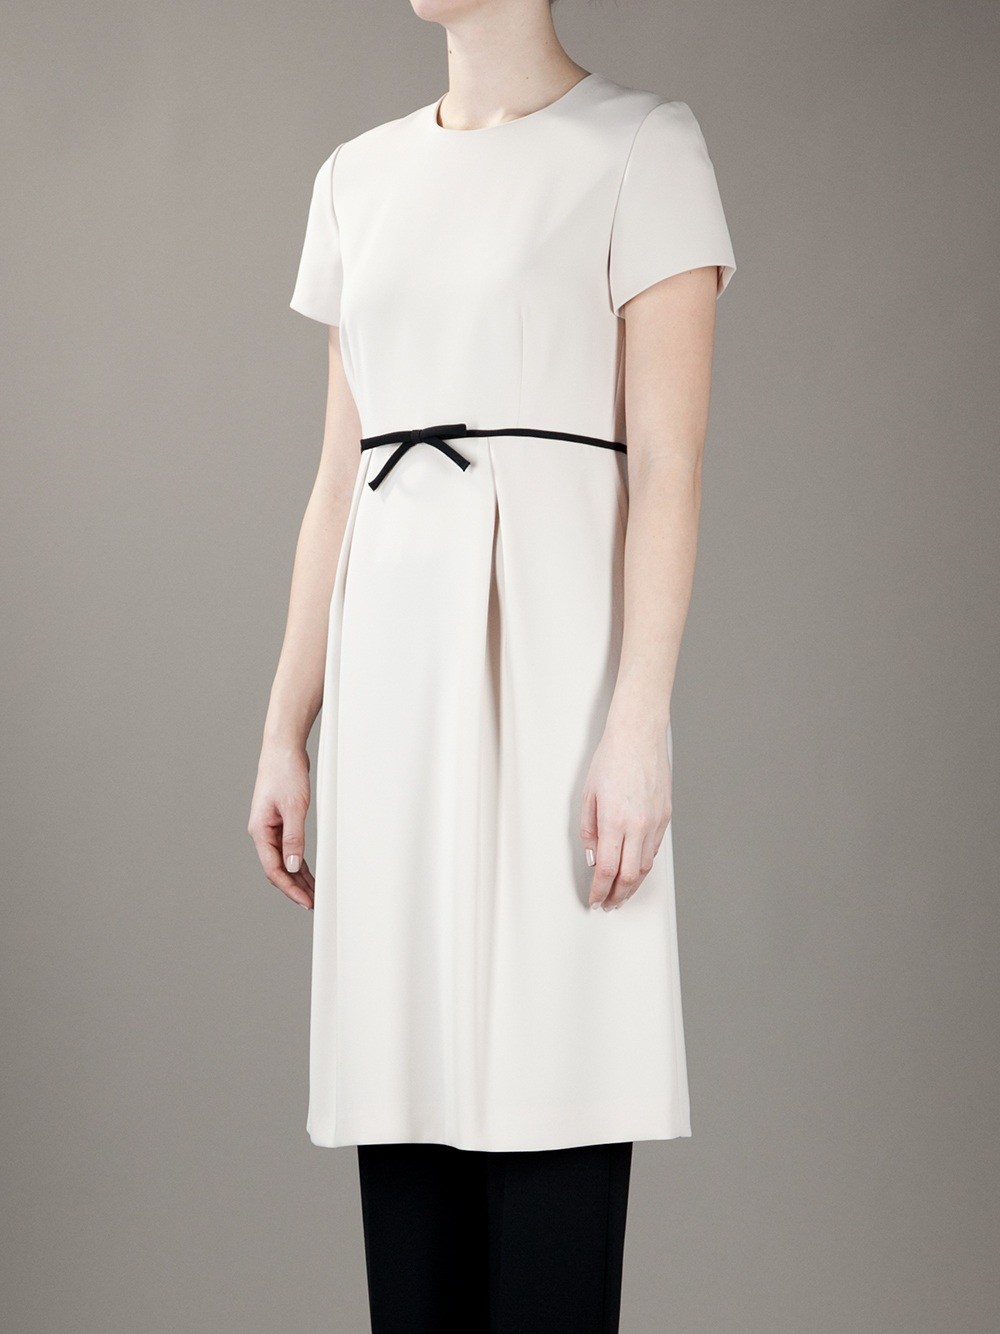 max mara studio verace dress in white lyst. Black Bedroom Furniture Sets. Home Design Ideas